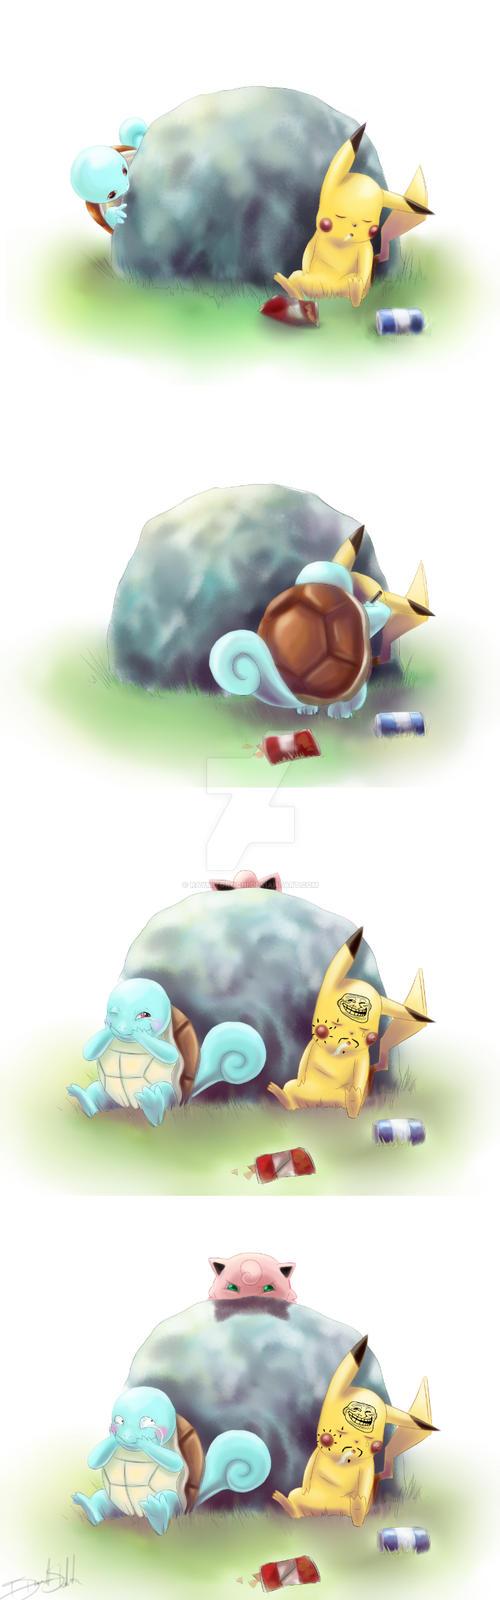 Silly Poke' Antics by raymitorochi